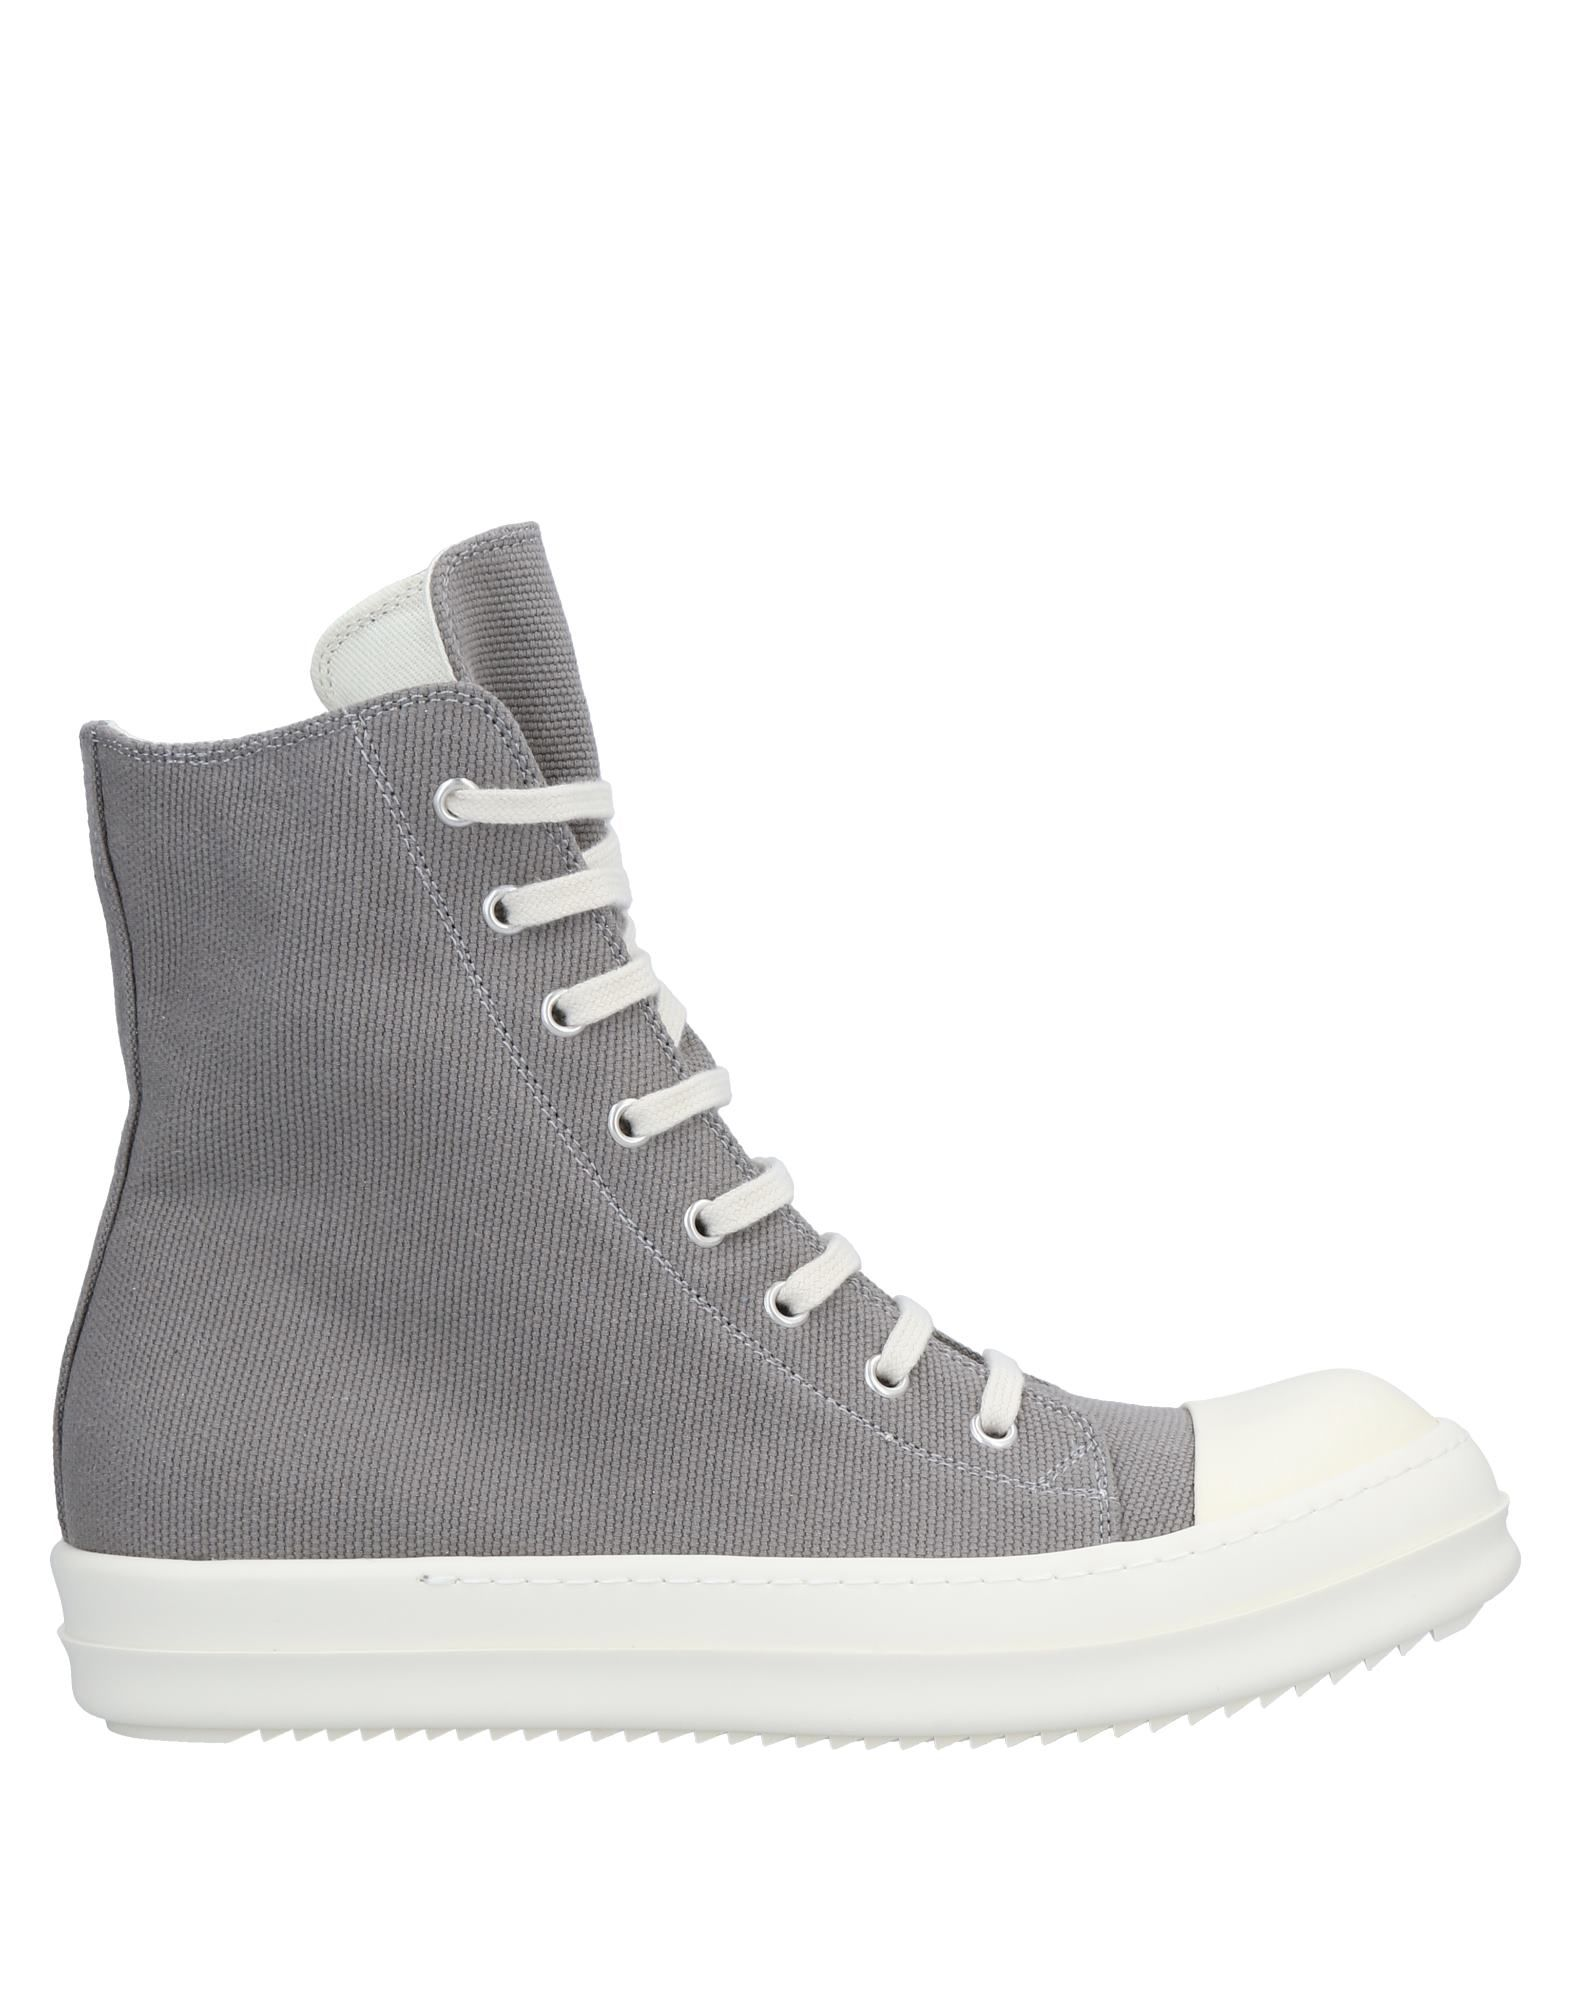 Drkshdw By Rick Owens By Sneakers - Men Drkshdw By Owens Rick Owens Sneakers online on  Australia - 11551372OE 1a364a